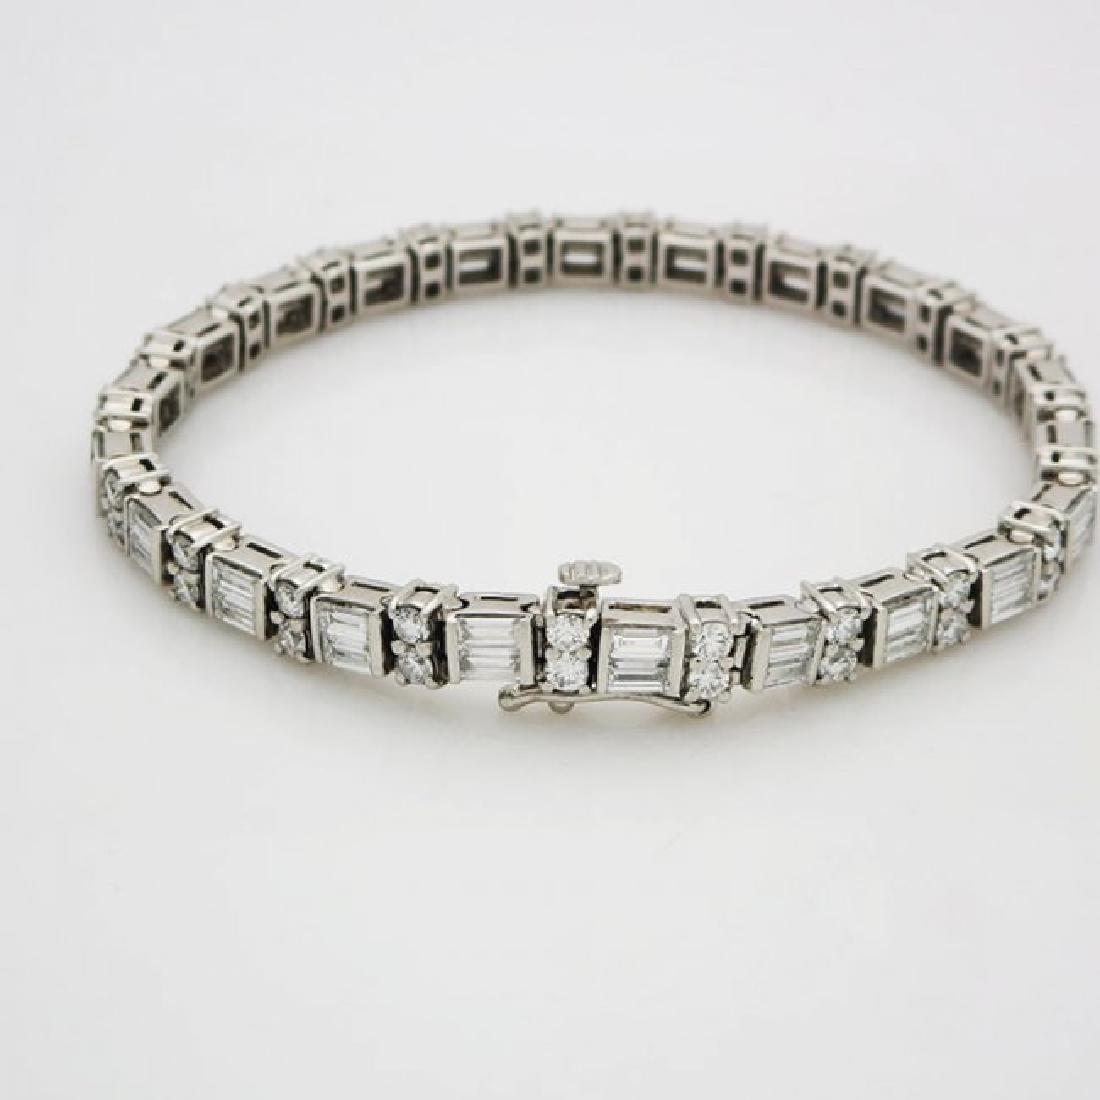 Estate 950 Platinum and apx 8CT VS/F Diamond Bracelet - 4